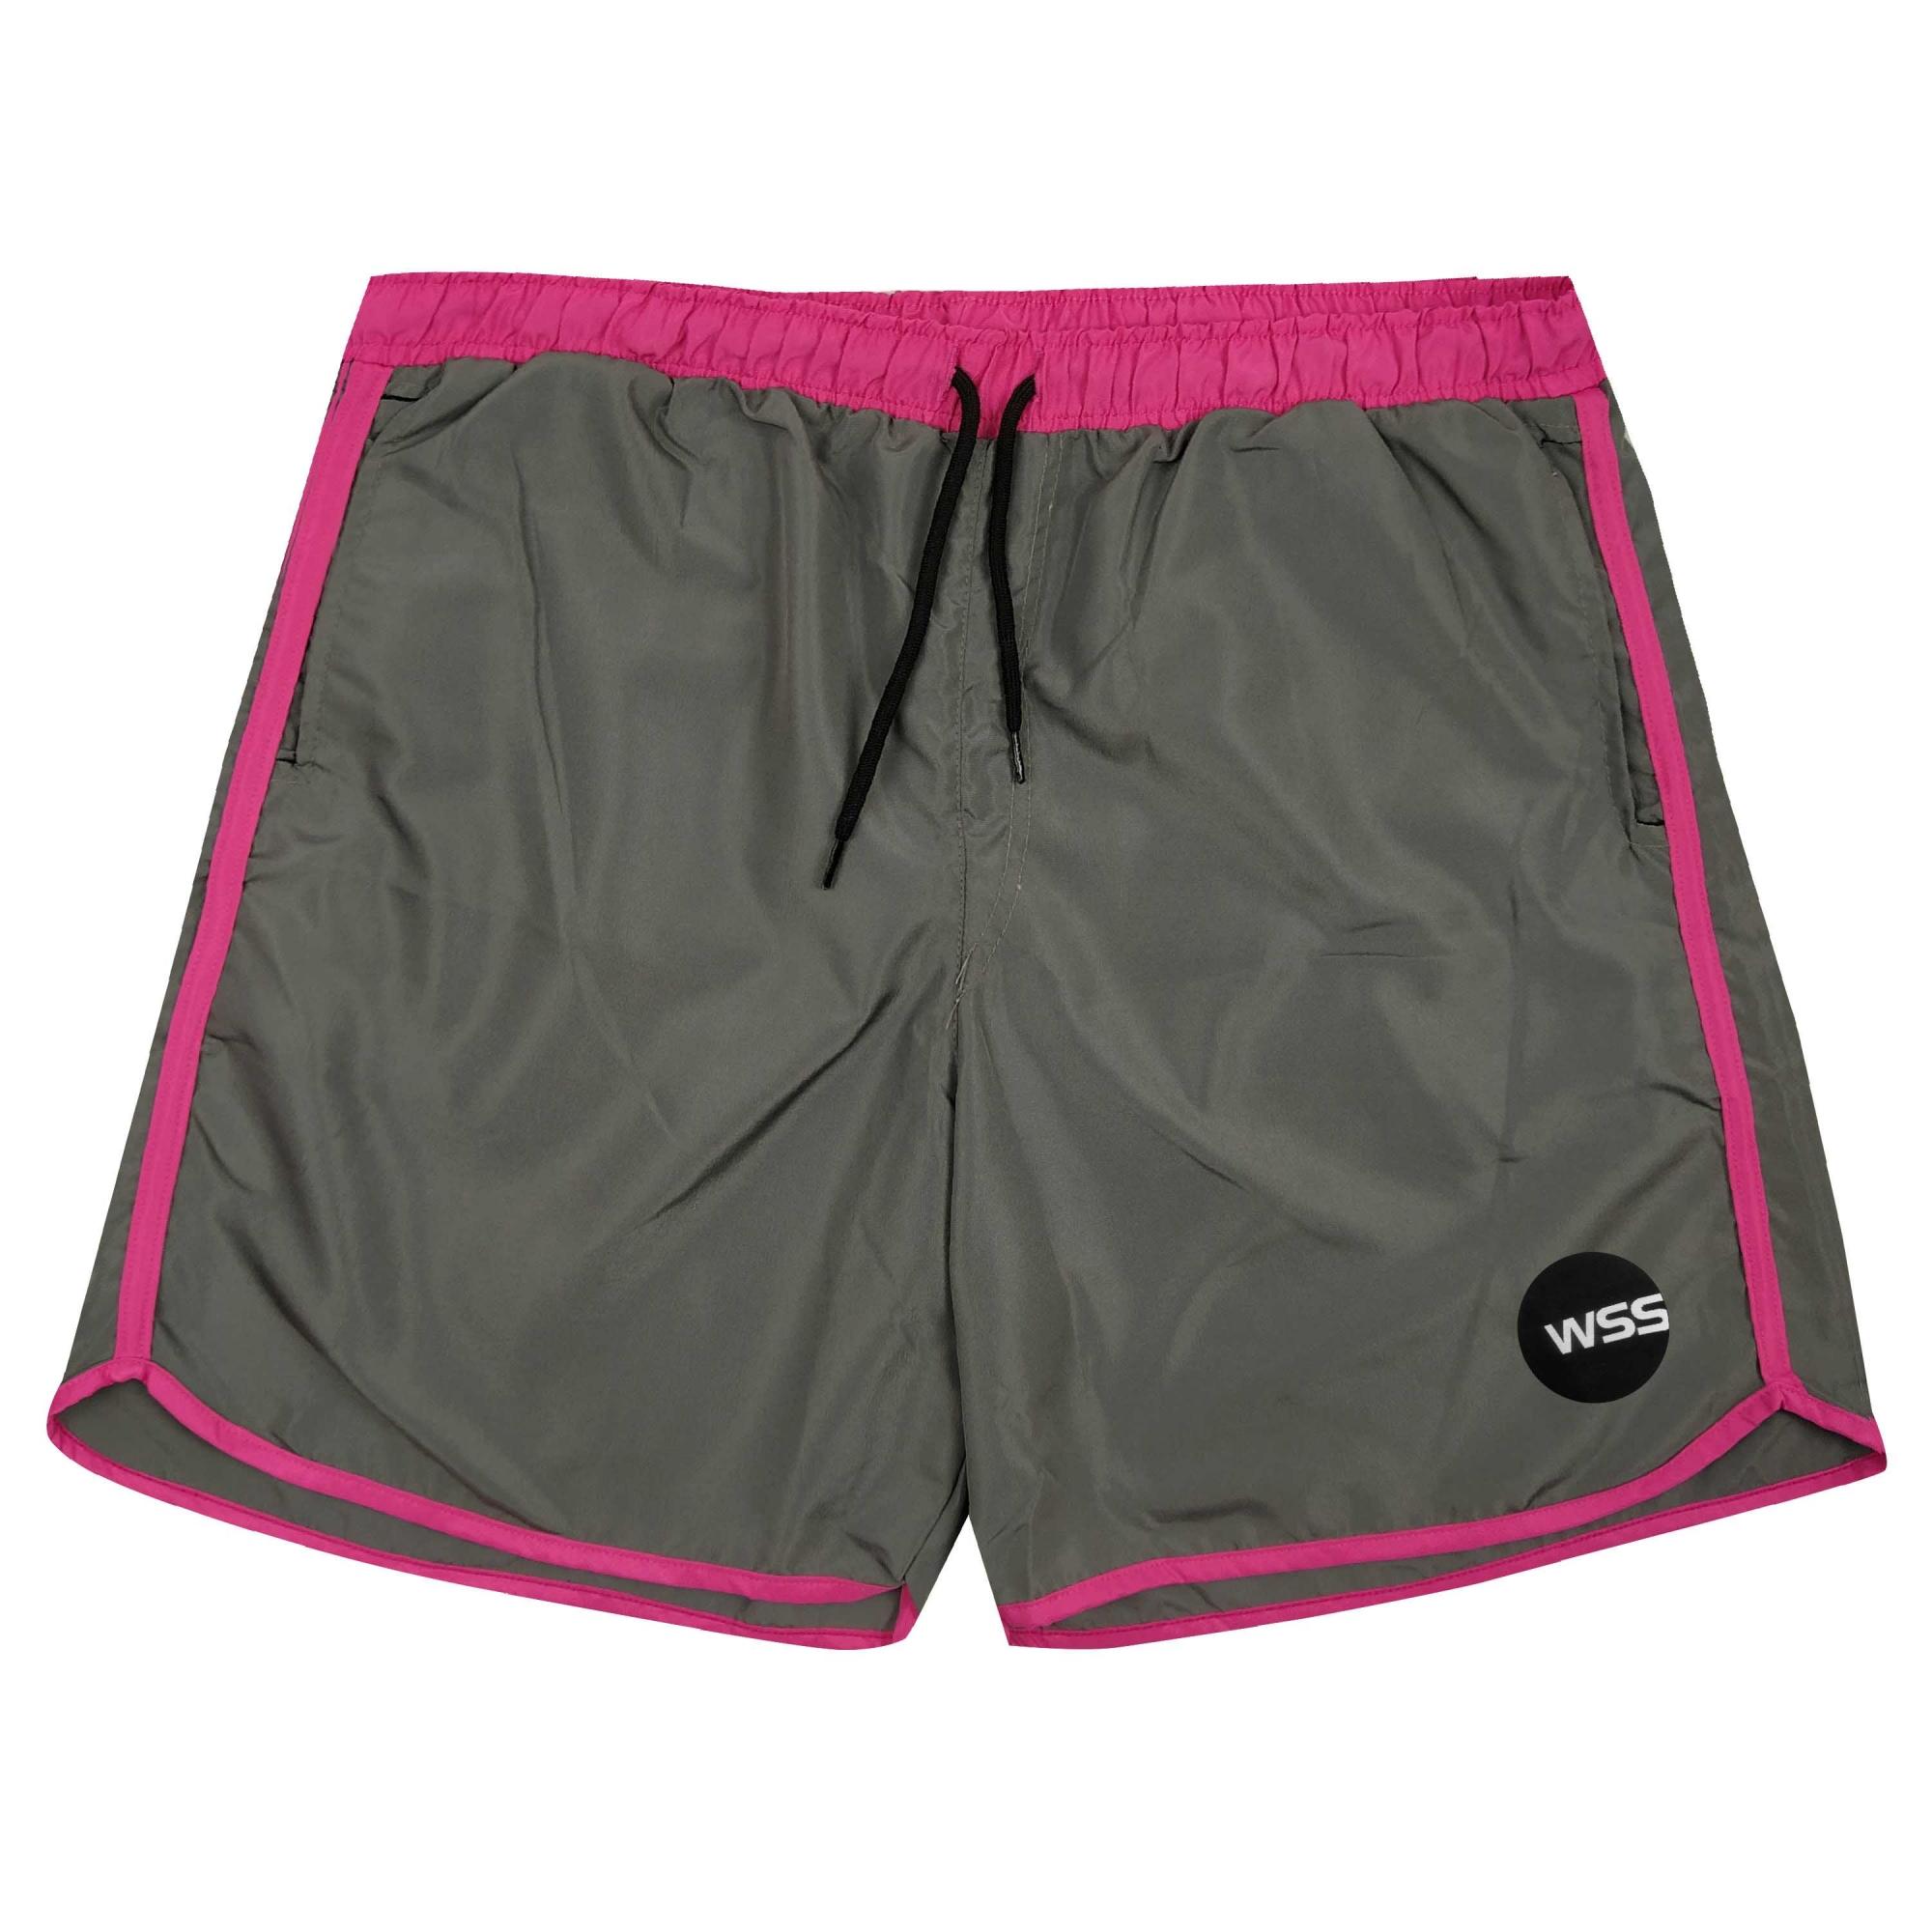 Shorts Masculino Moon WSS Colors Tactel DarkPink